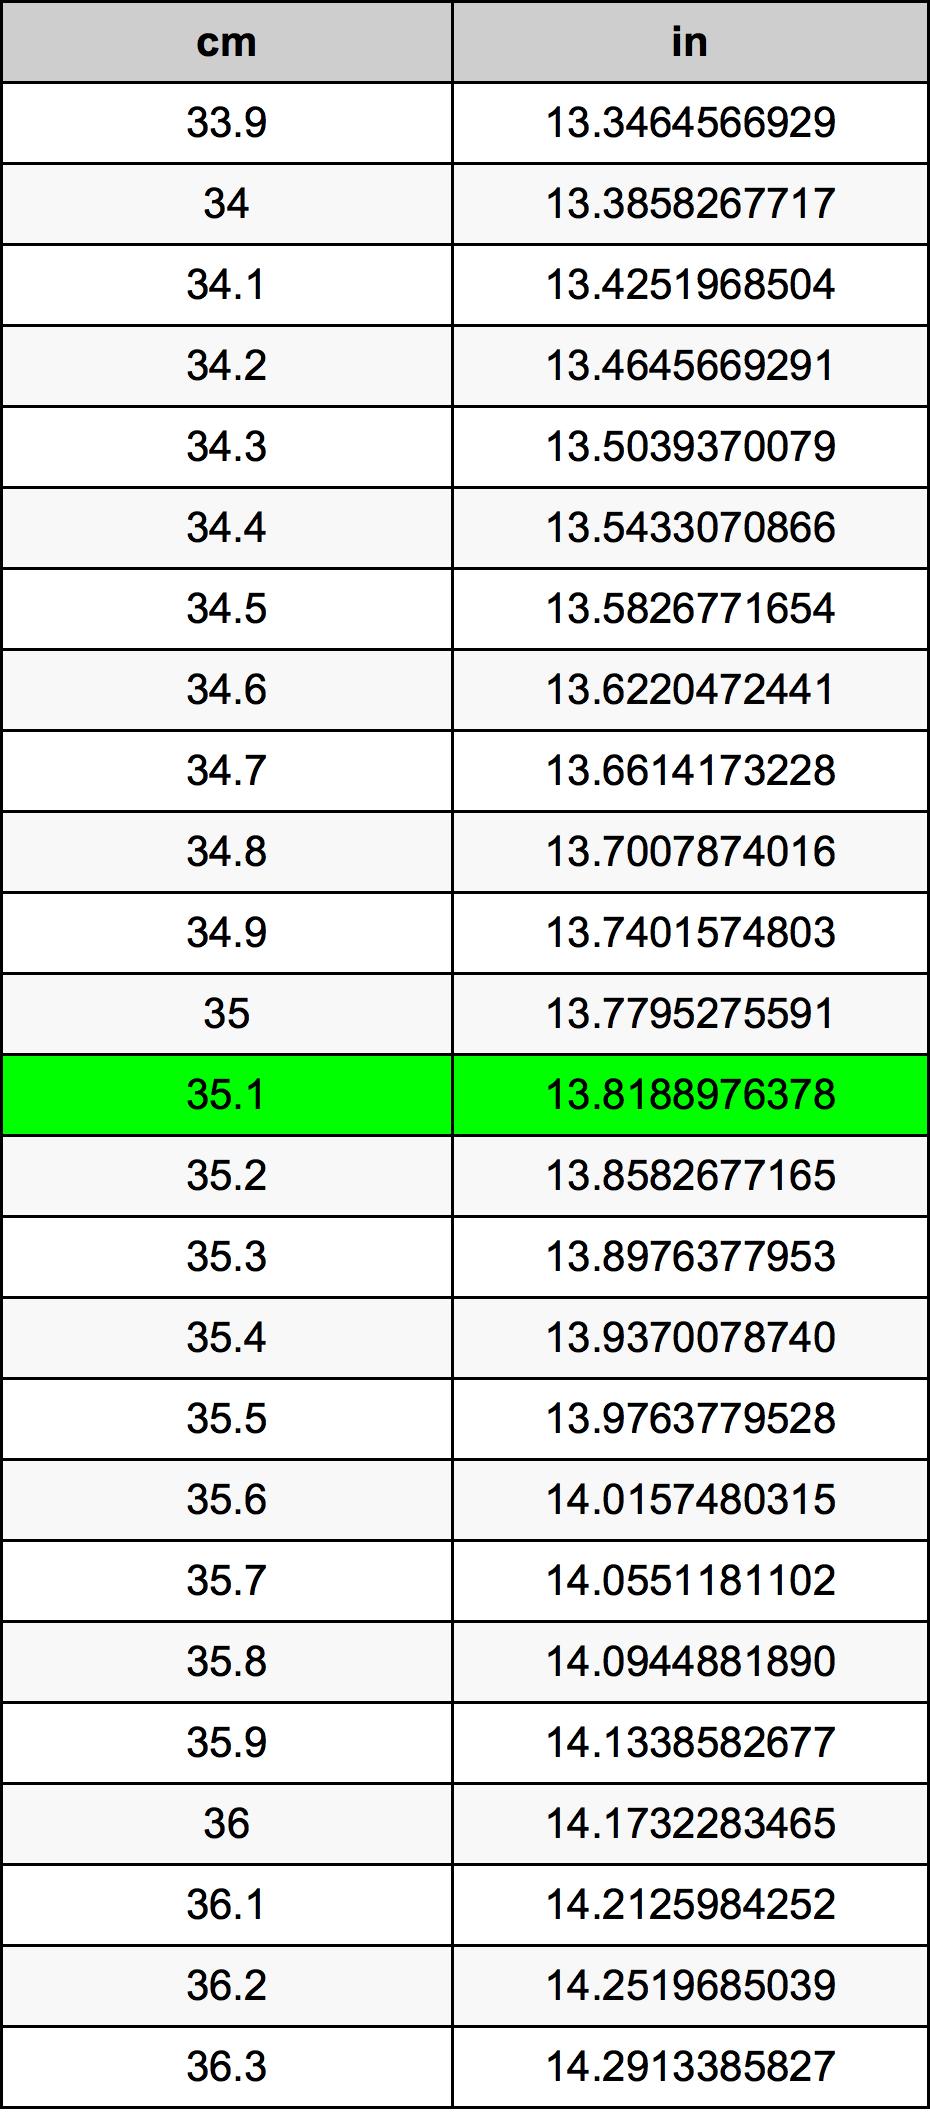 35.1 Centimeter Table